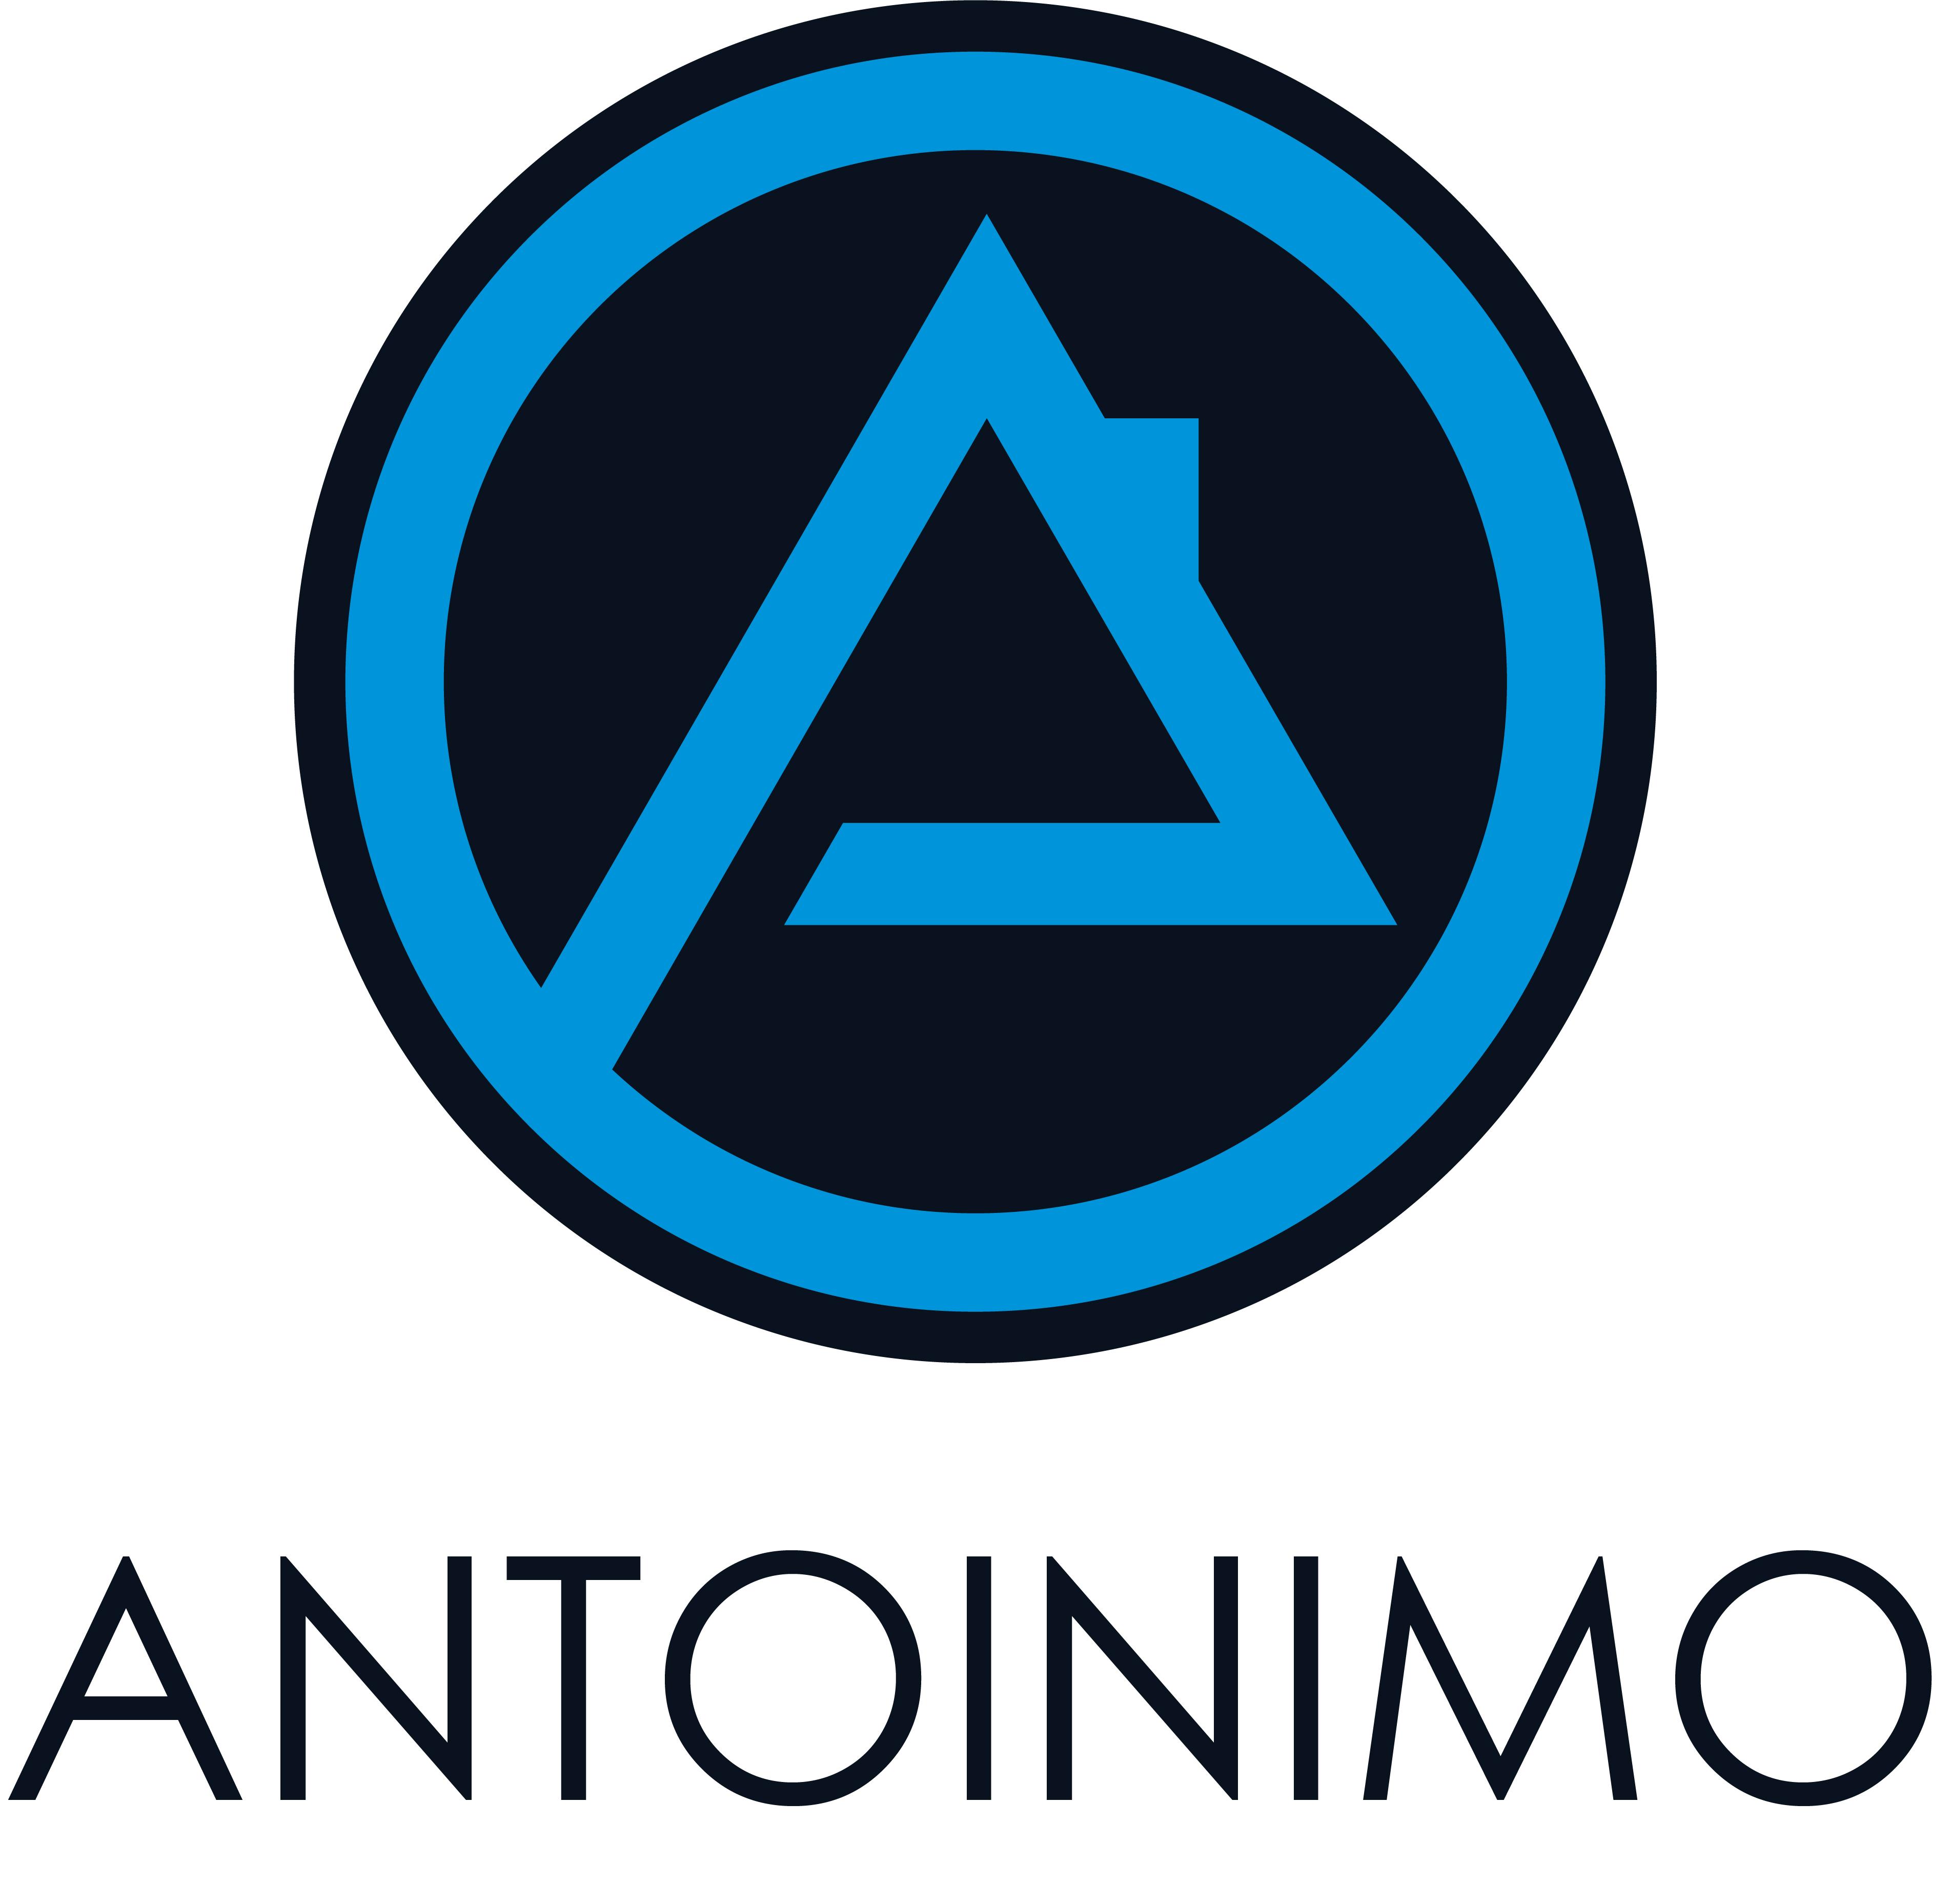 ANTOINIMO